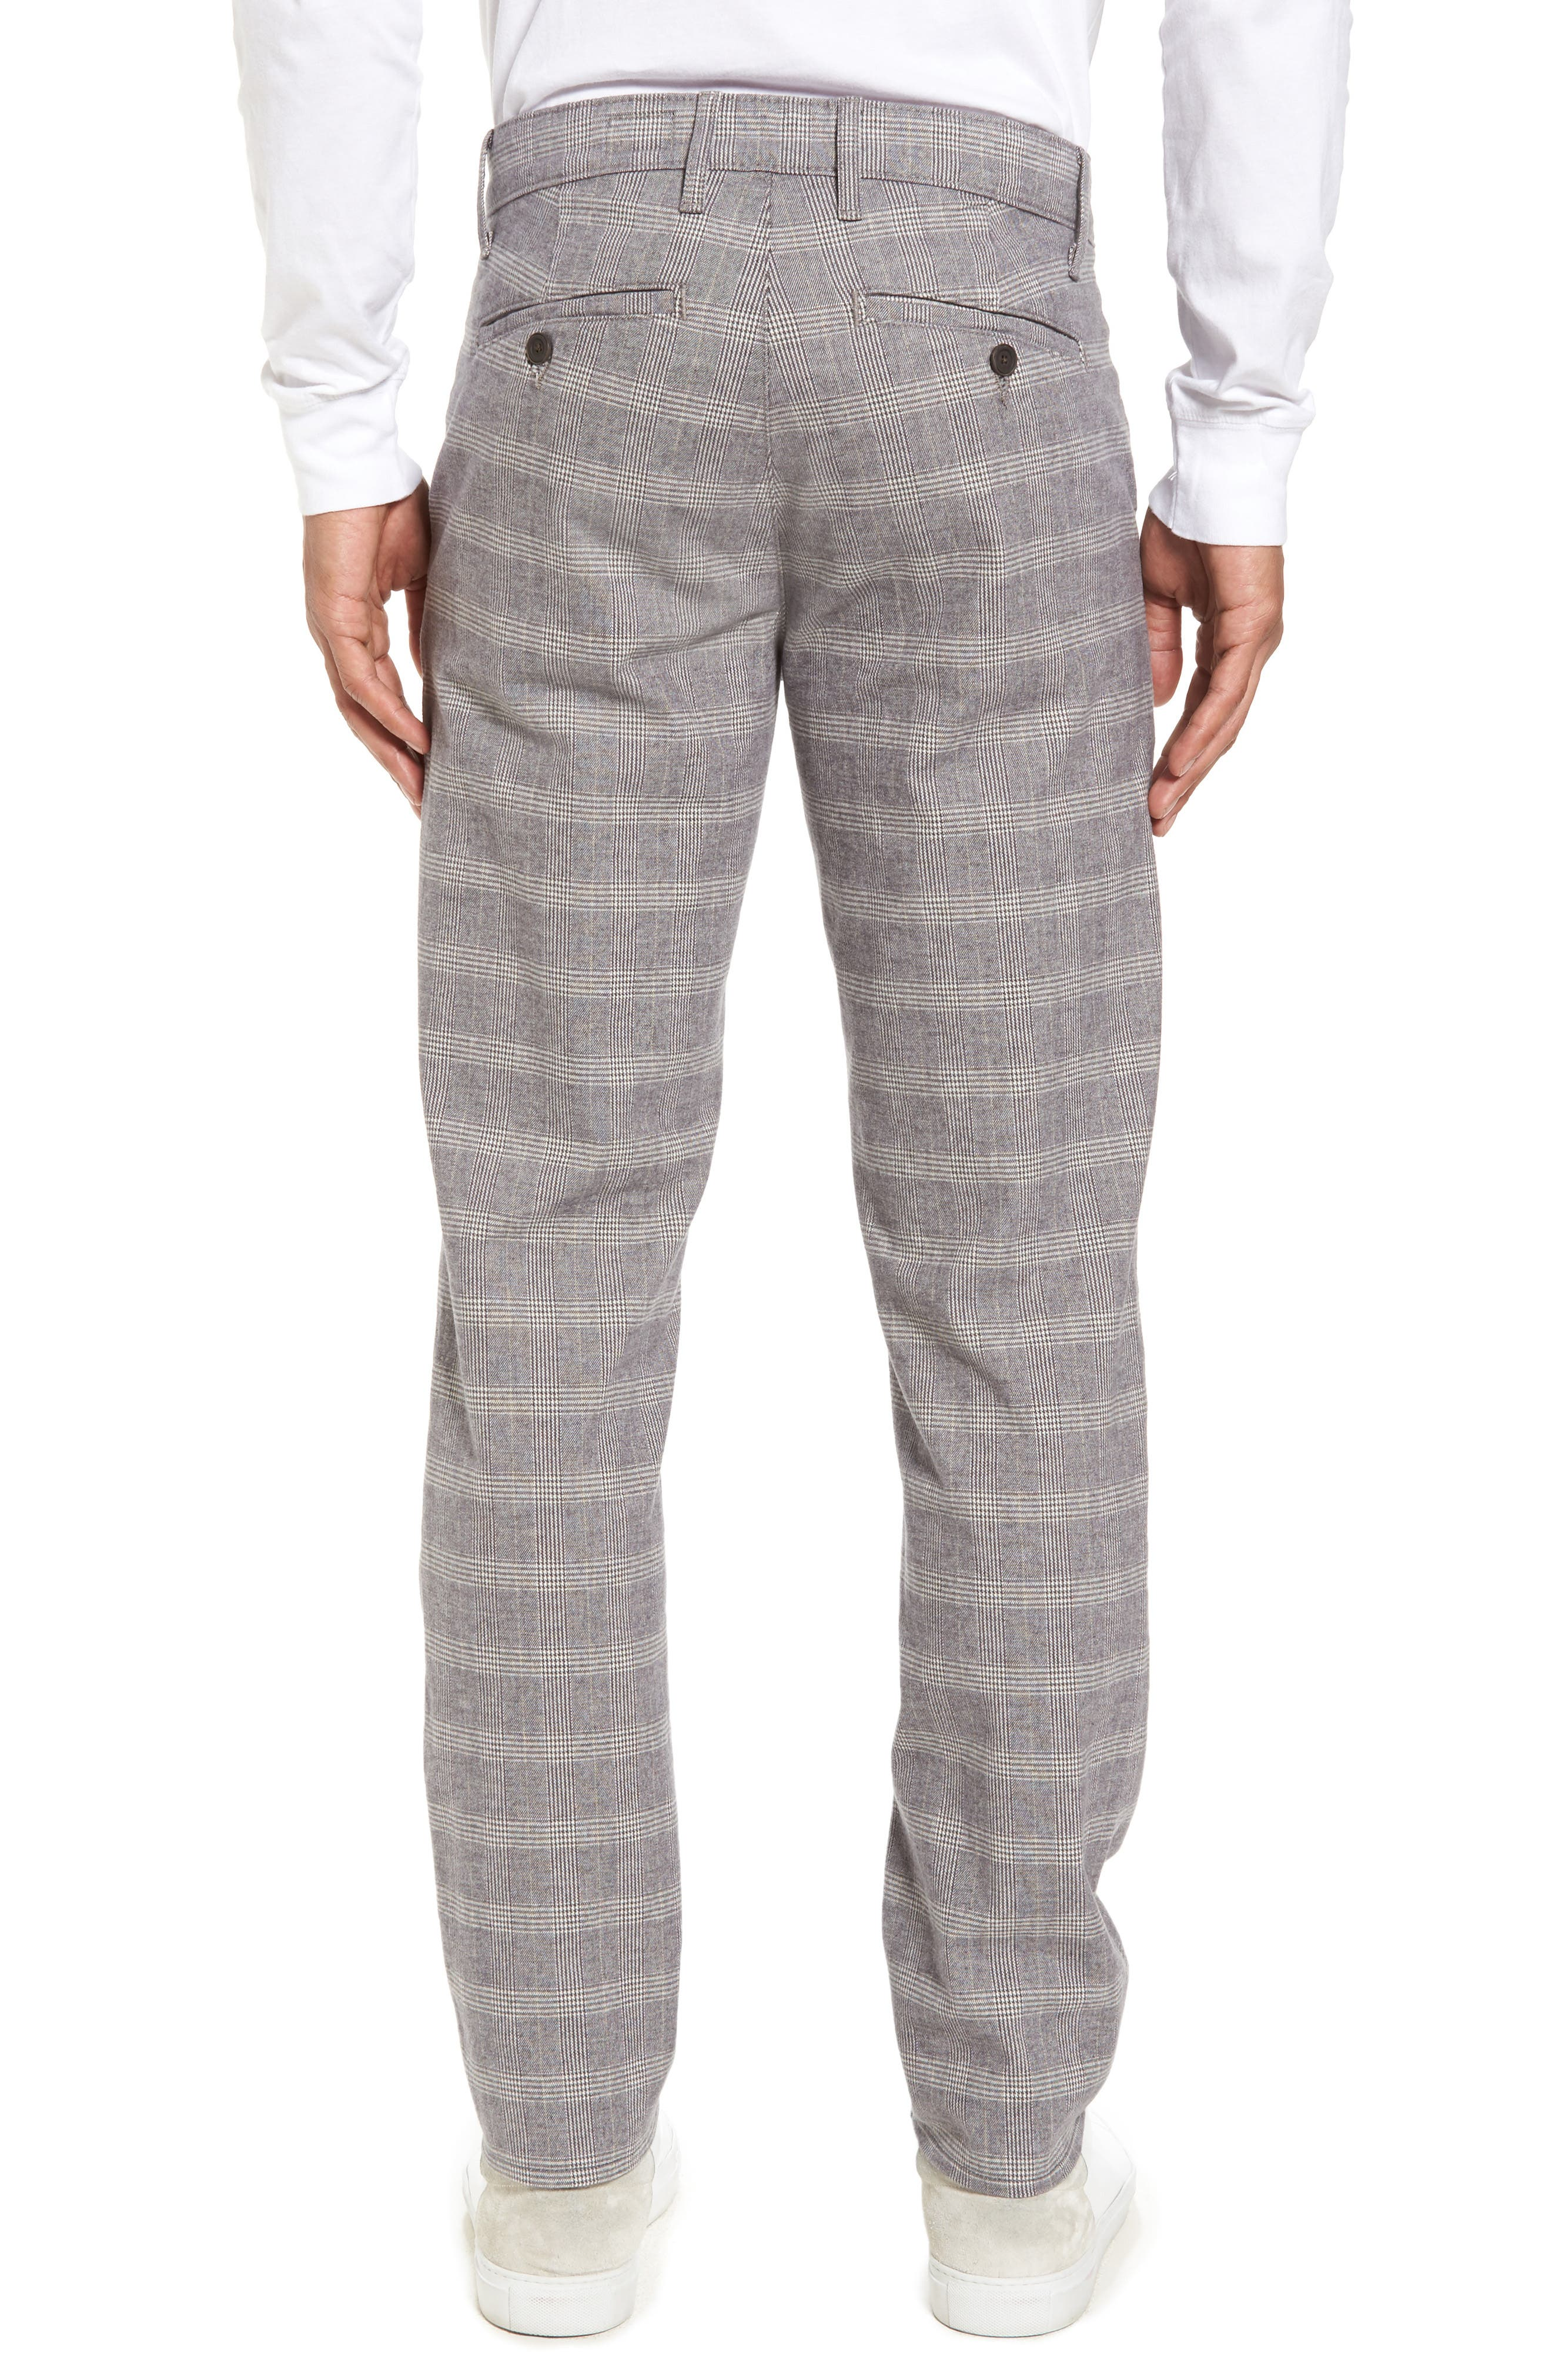 Marshall Slim Fit Pants,                             Alternate thumbnail 2, color,                             250